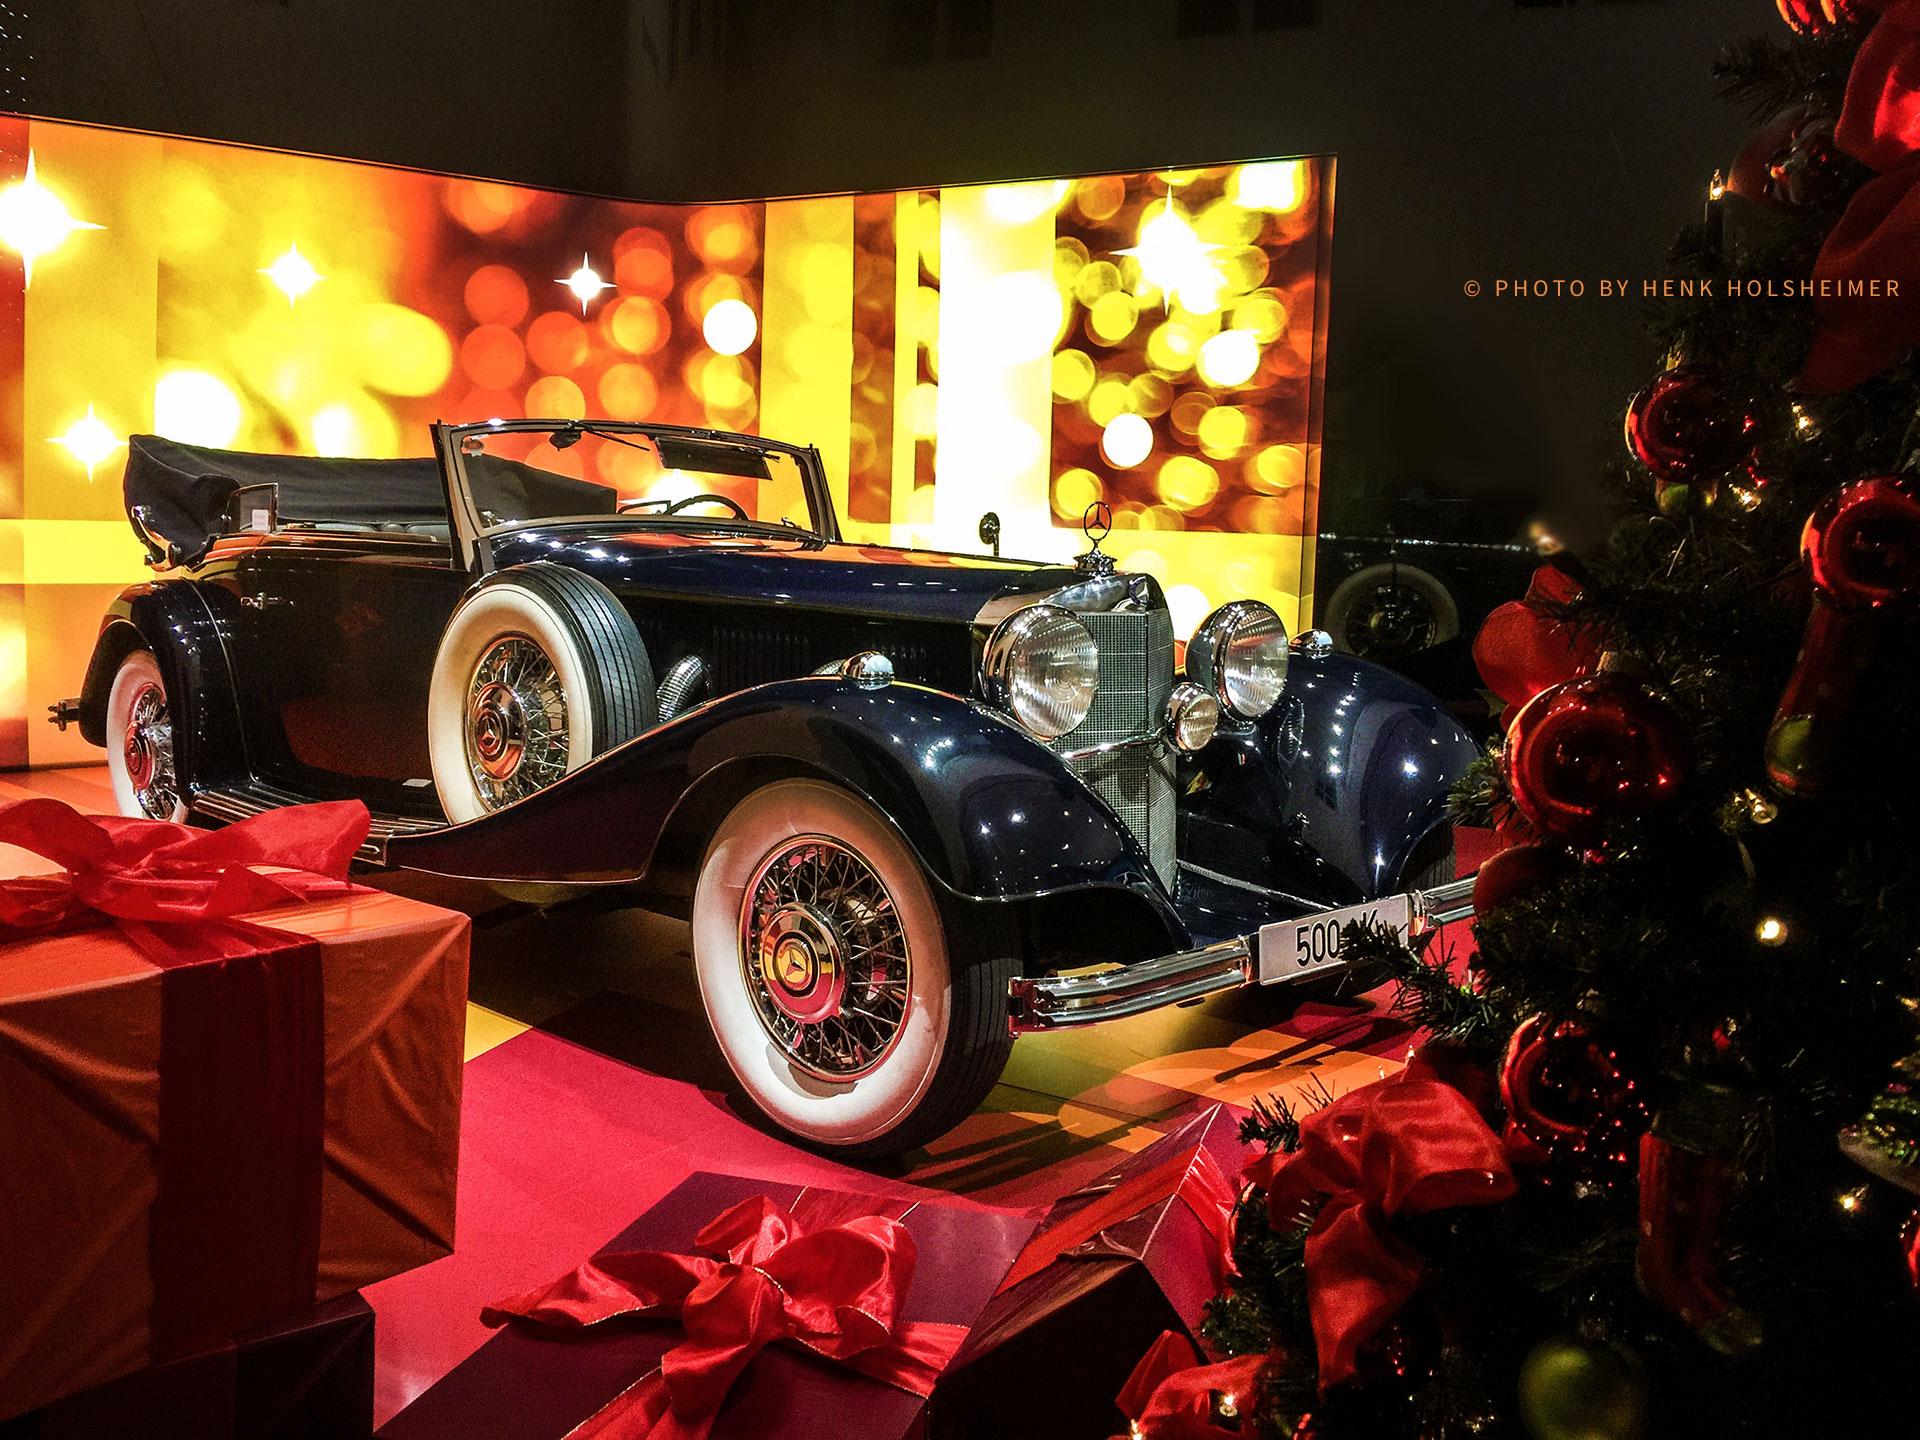 2014-12_Xmas_Mercedes_1920